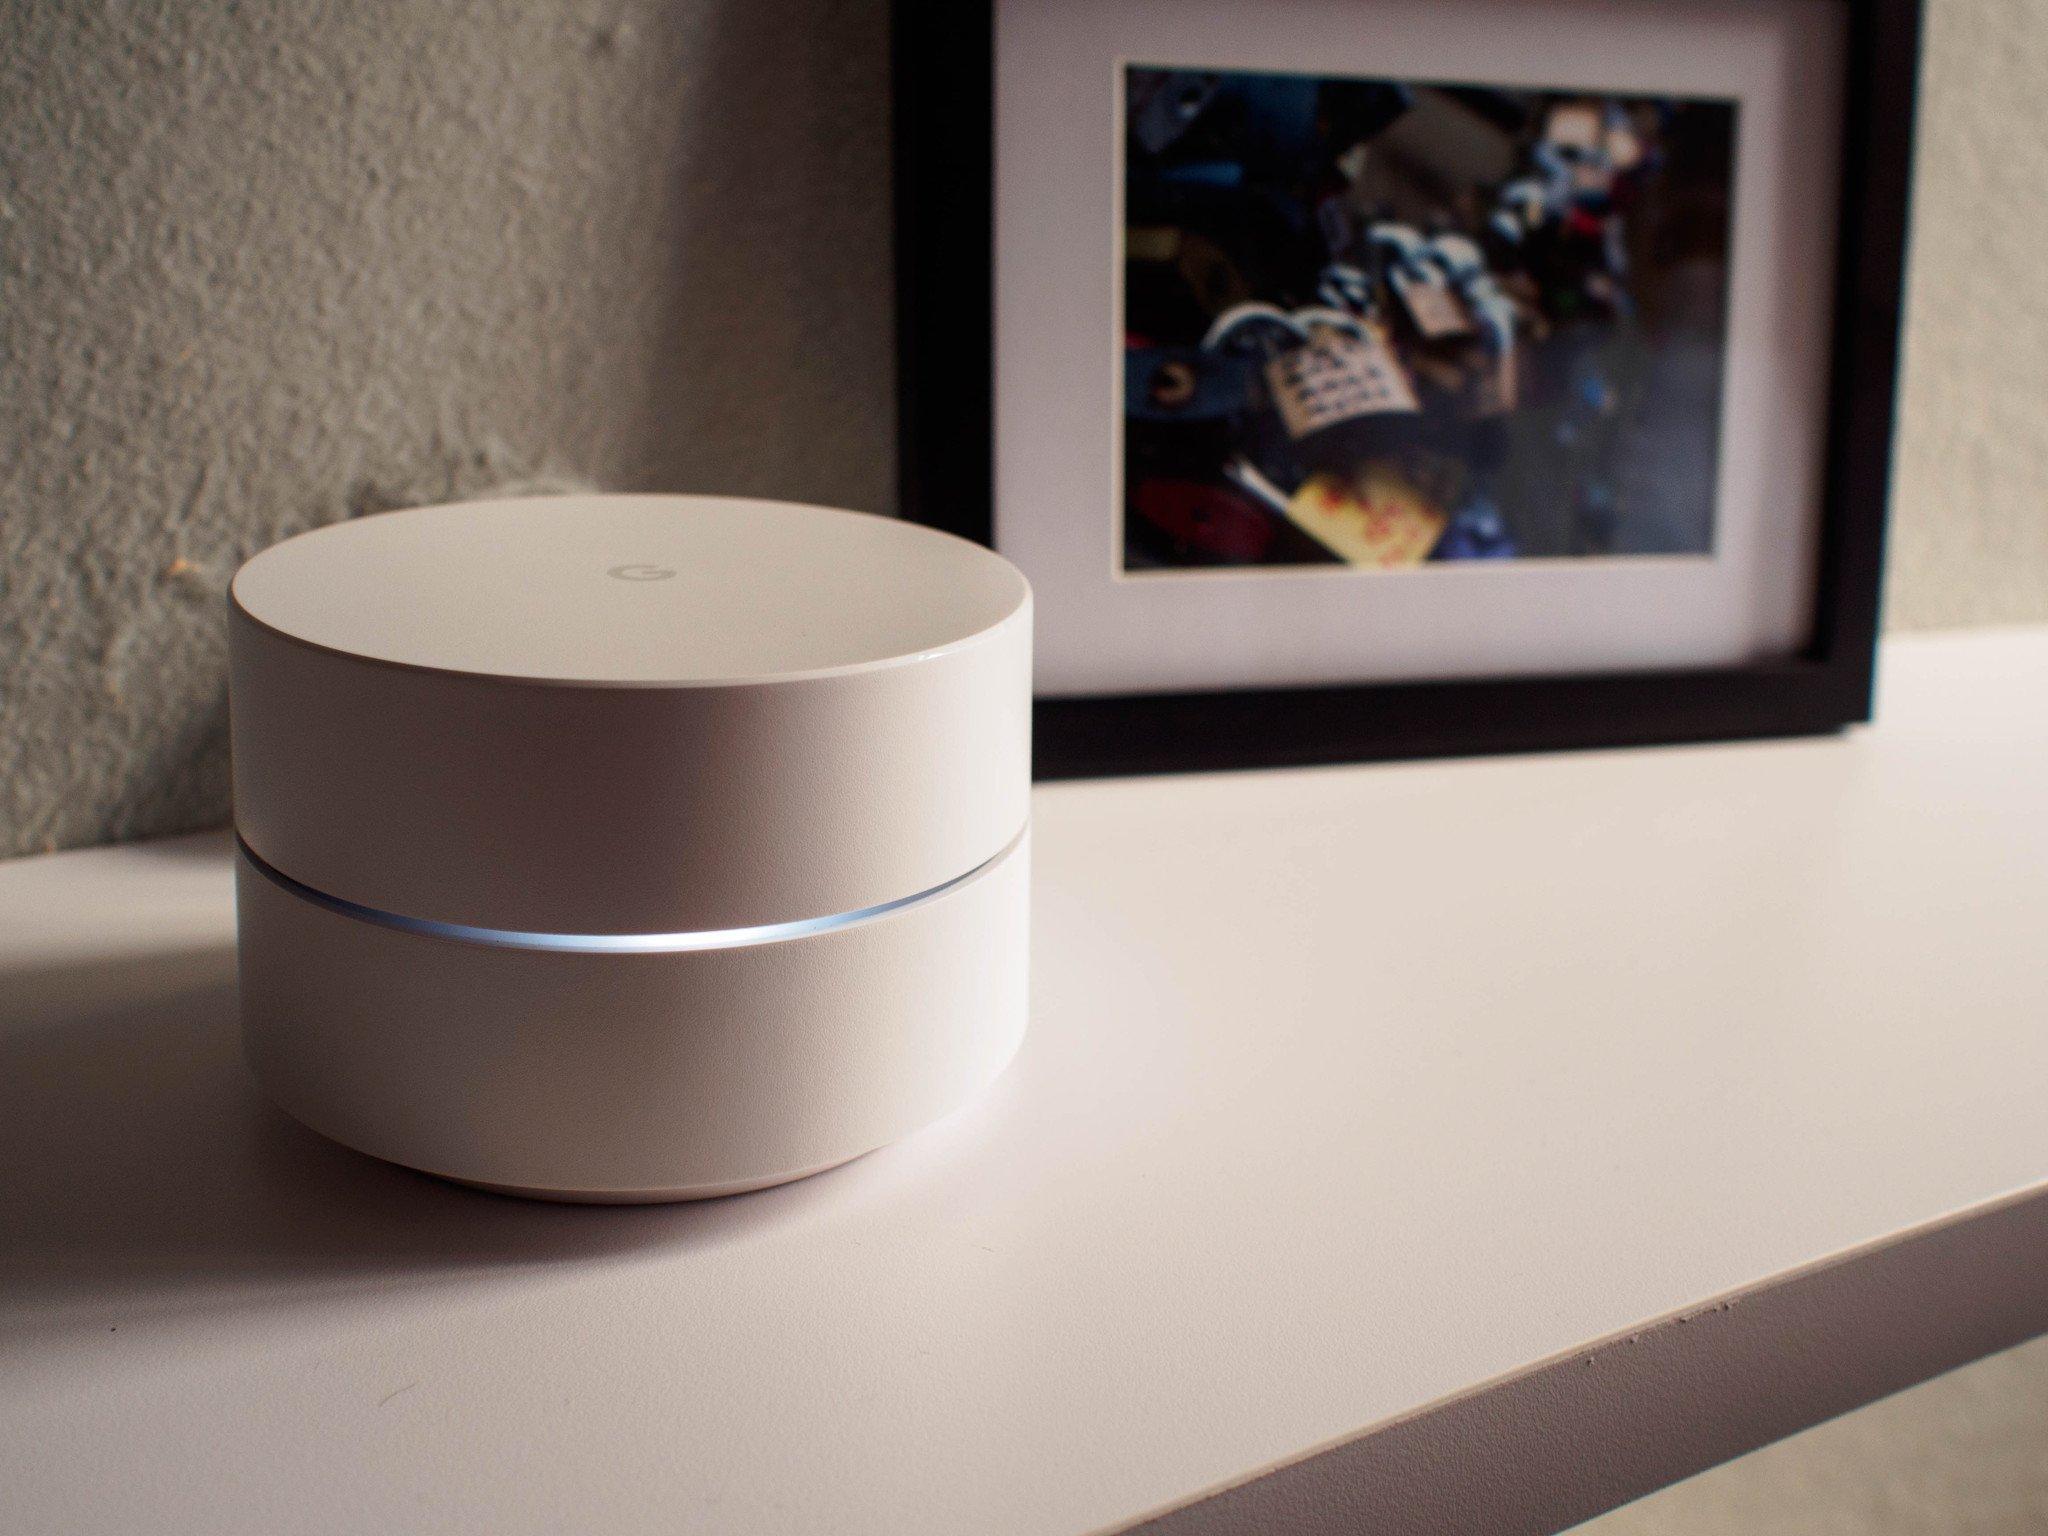 medium resolution of google wifi